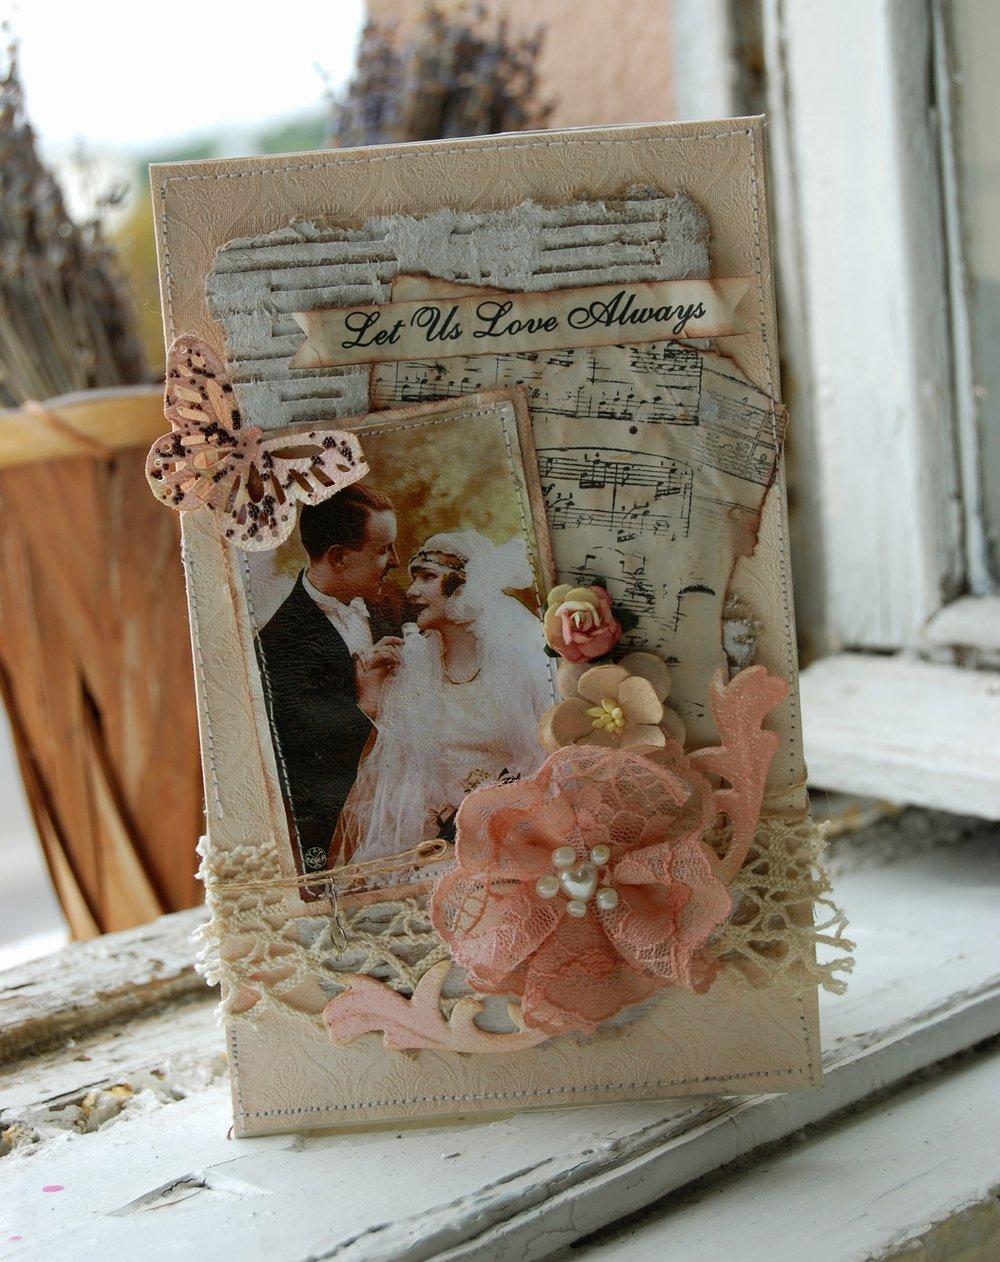 кровати-шкафа свои открытки со своим фото рецепт зиму